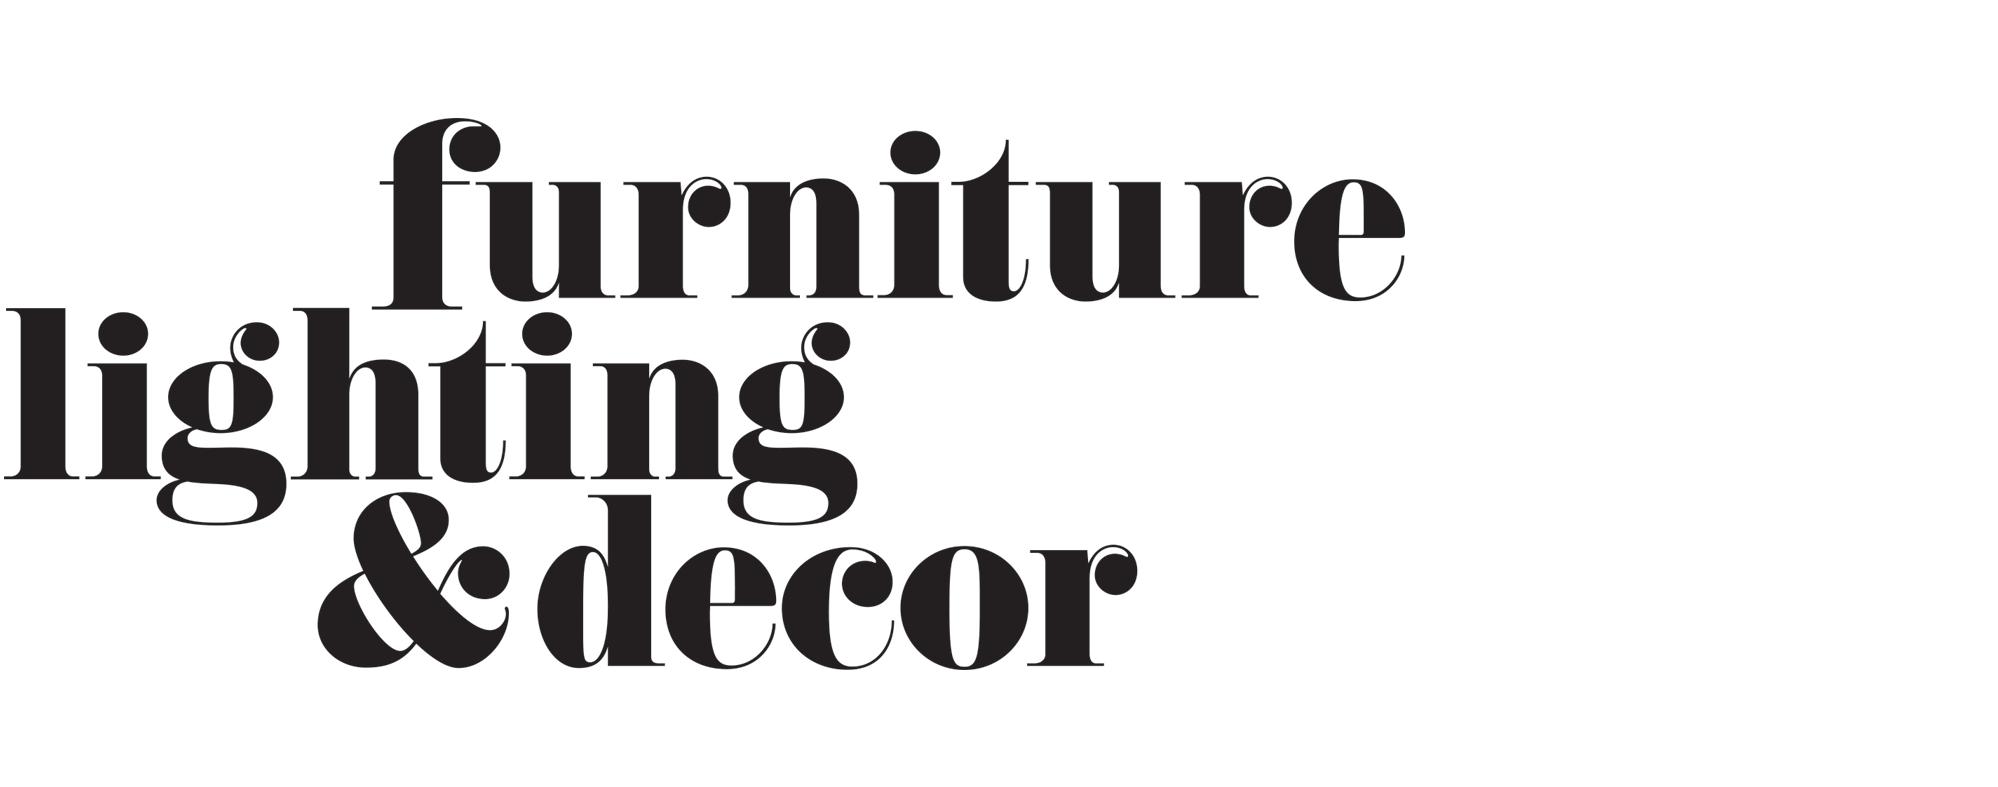 Furniture, Lighting & Decor